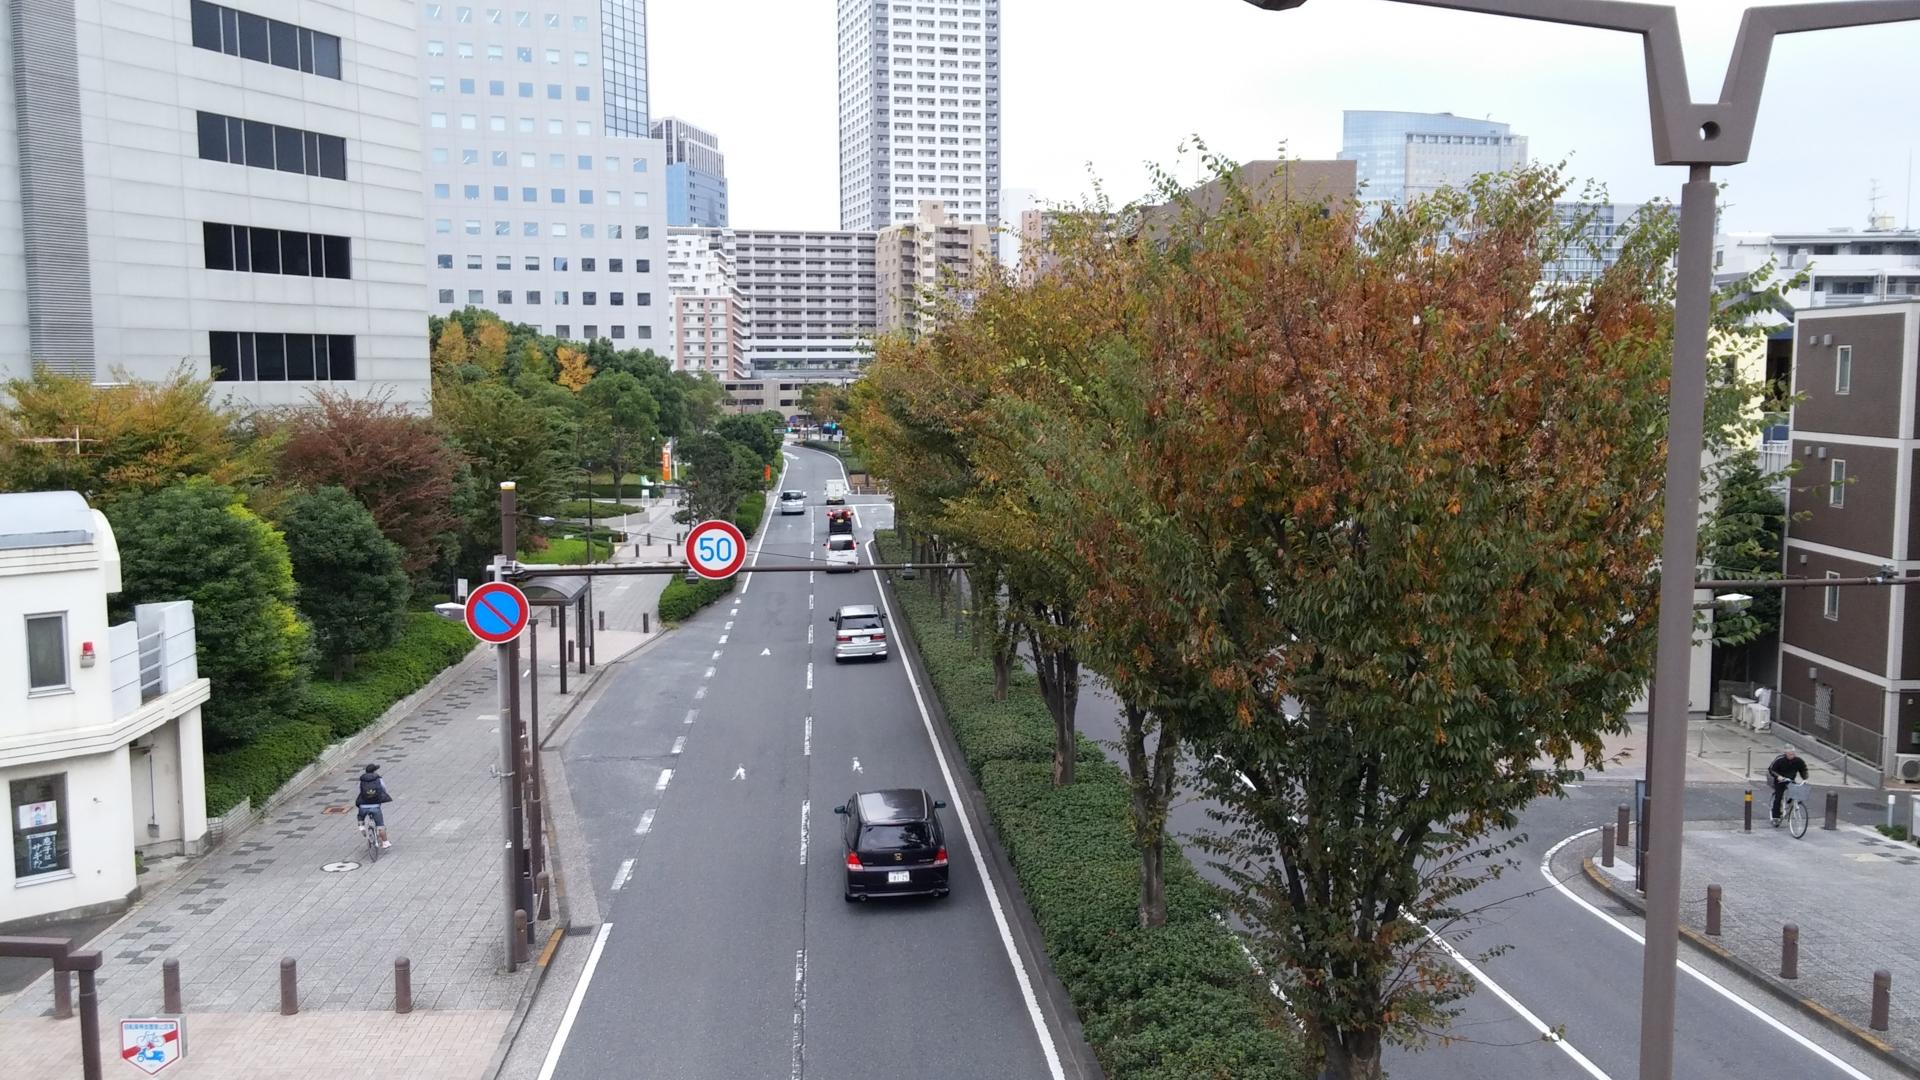 f:id:ToshUeno:20141108104853j:plain